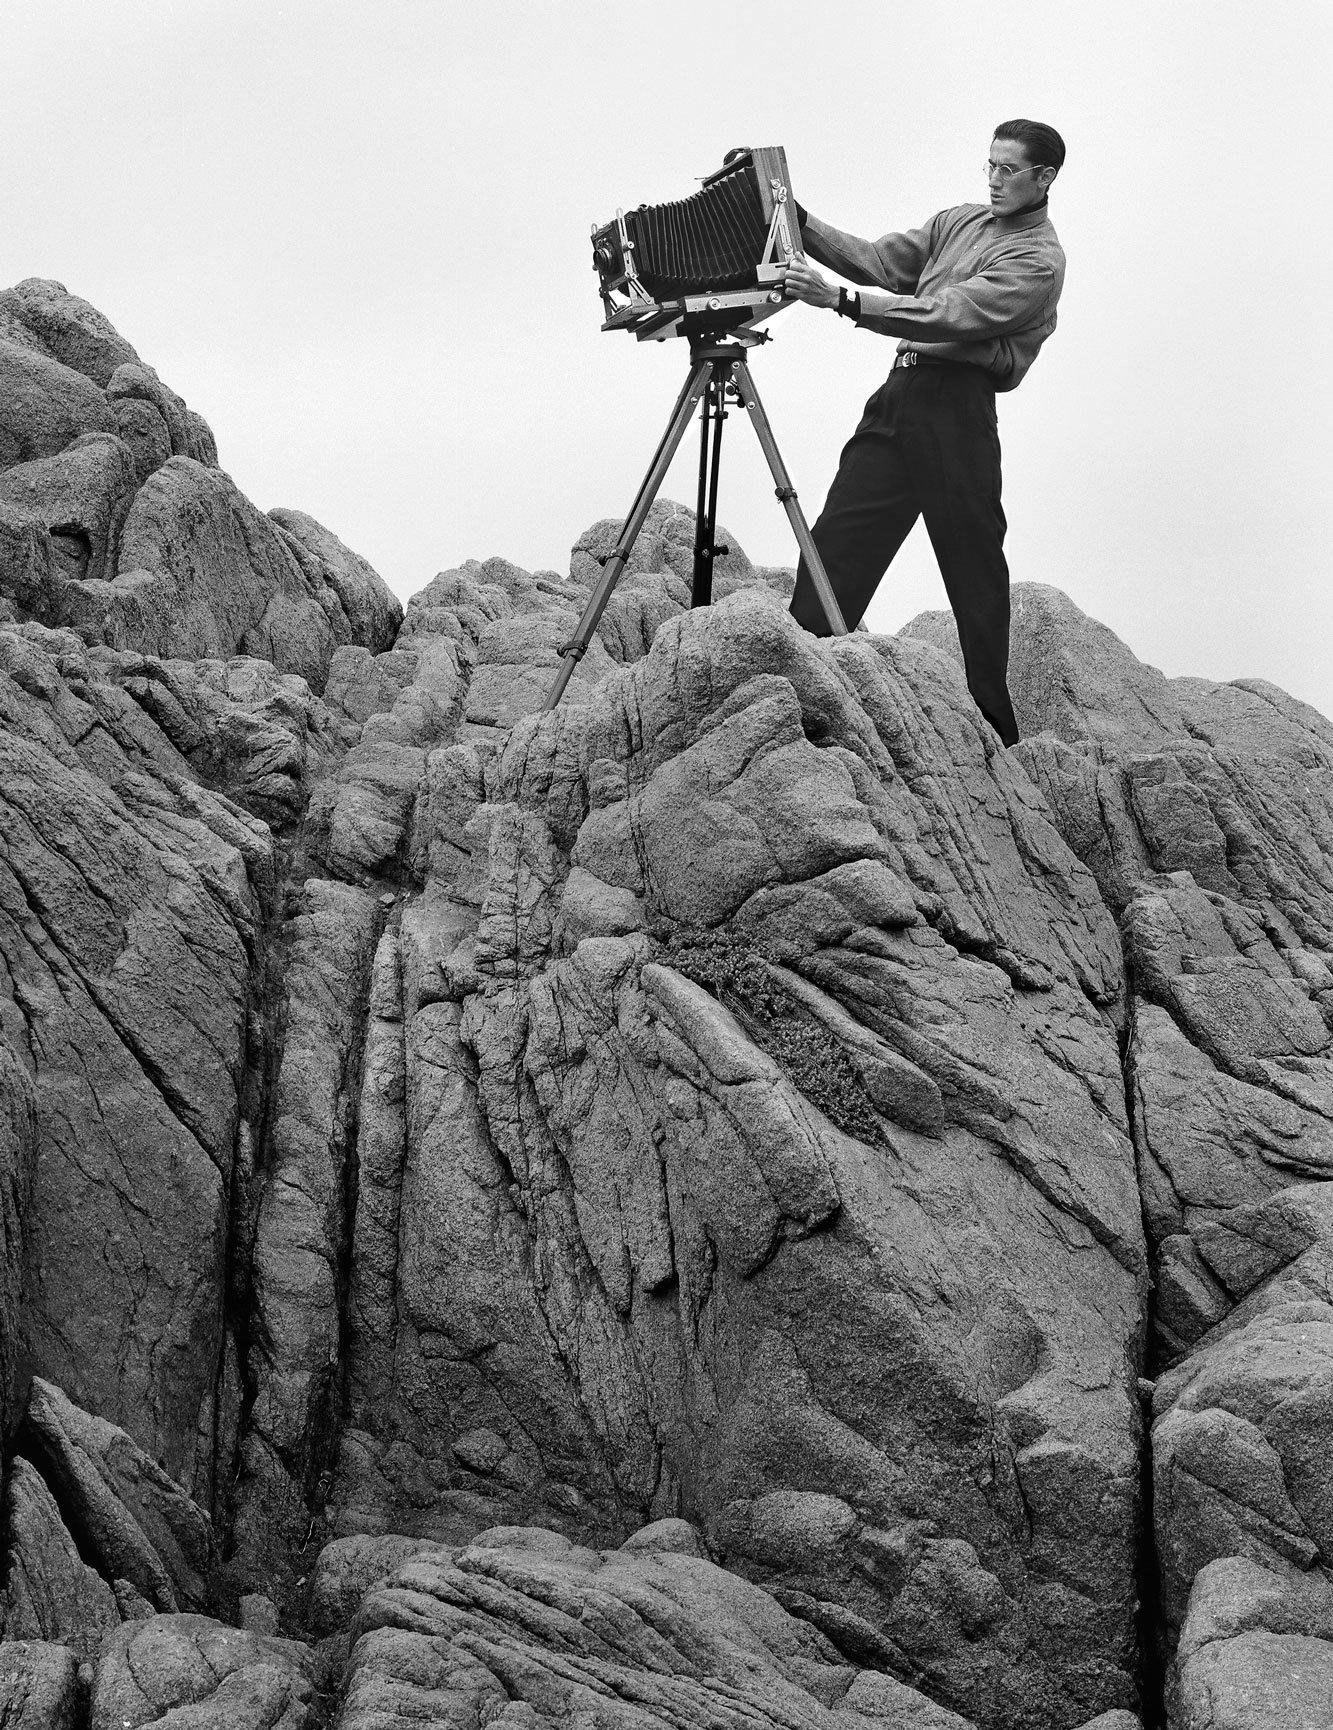 B&W, Fashion Photography, Carmel, California, Hassleblad Film Photography, View Camera.